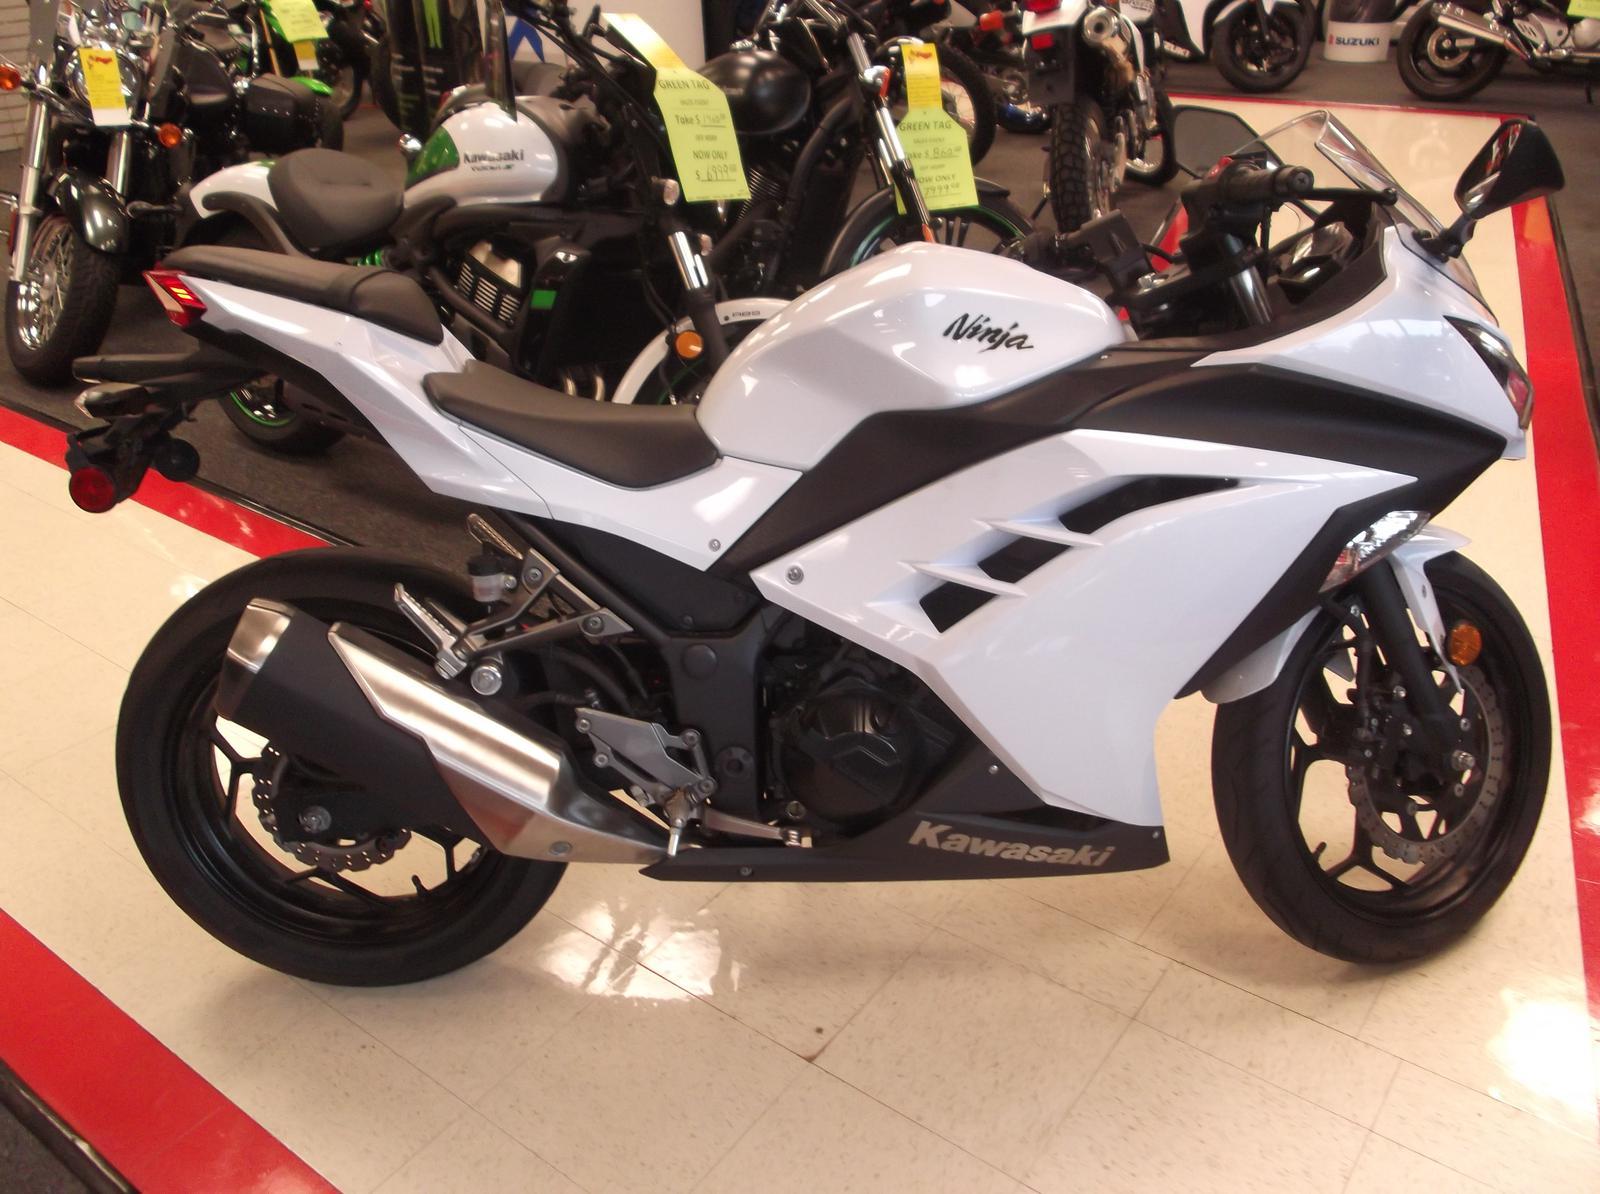 2013 Kawasaki 300 NINJA for sale in Roxboro, NC | Fox's Suzuki ...